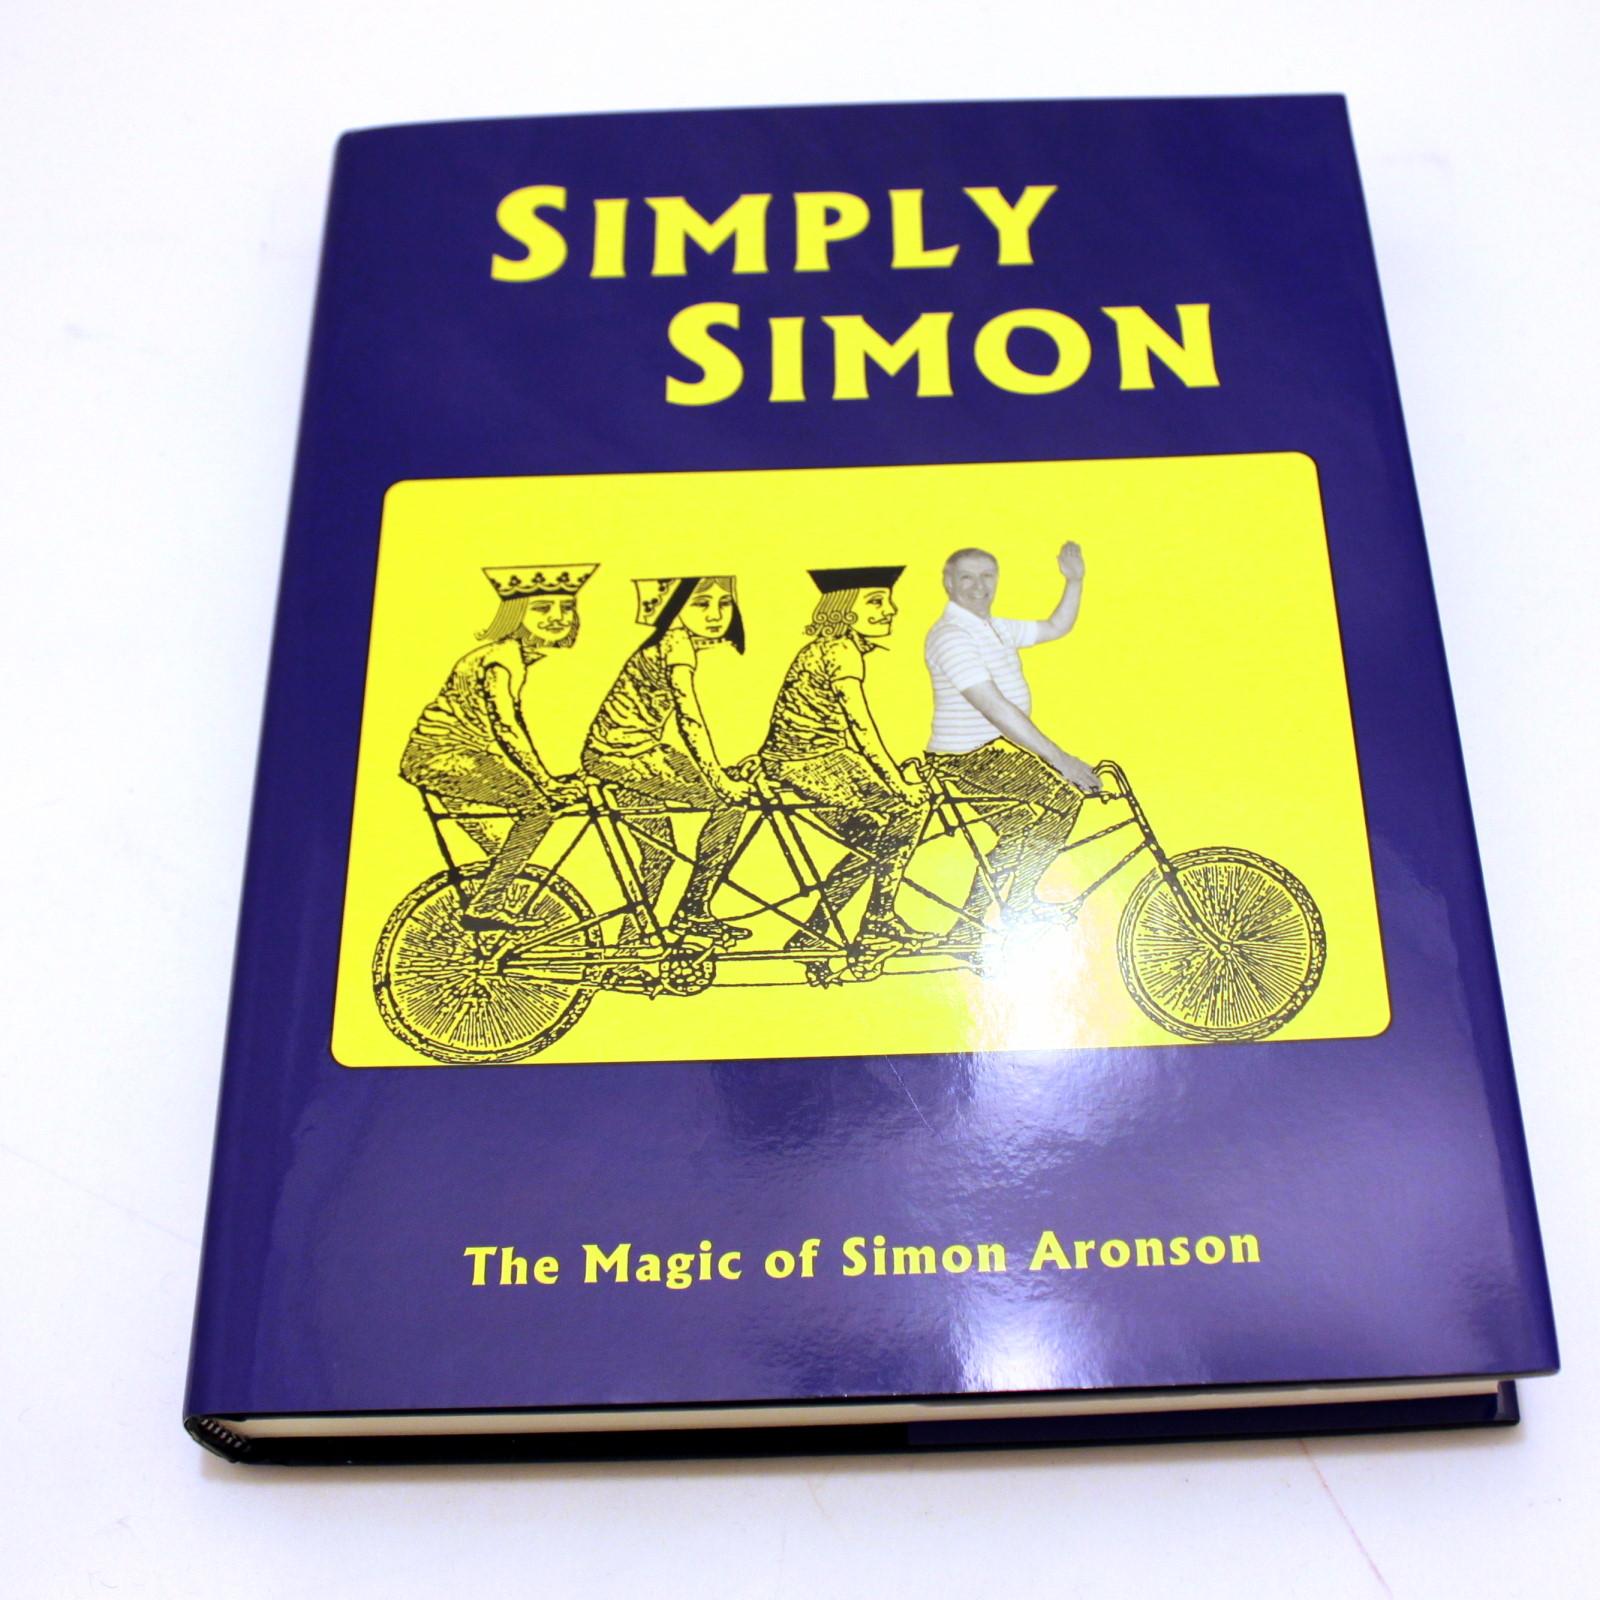 Simply Simon by Simon Aronson